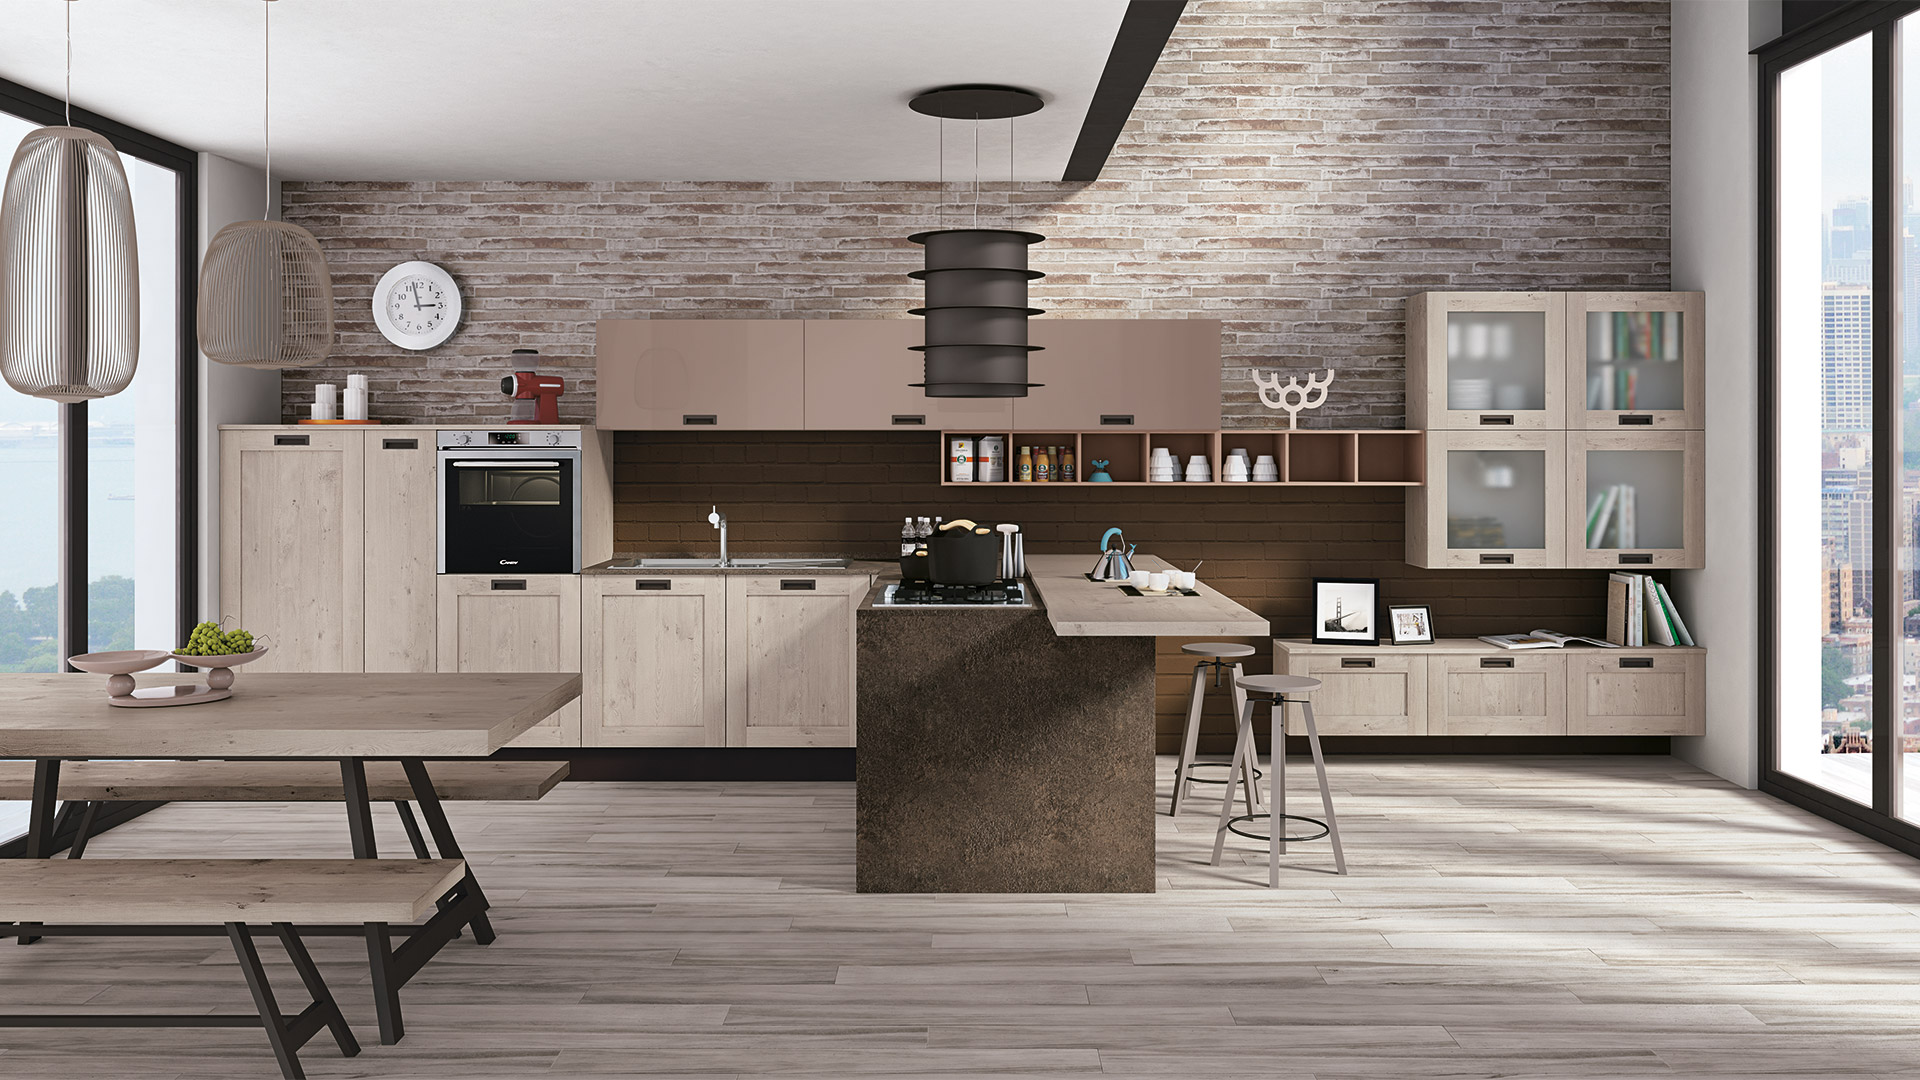 Cucina Kyra Creo Prezzo cucina moderna kyra telaio - creo kitchens